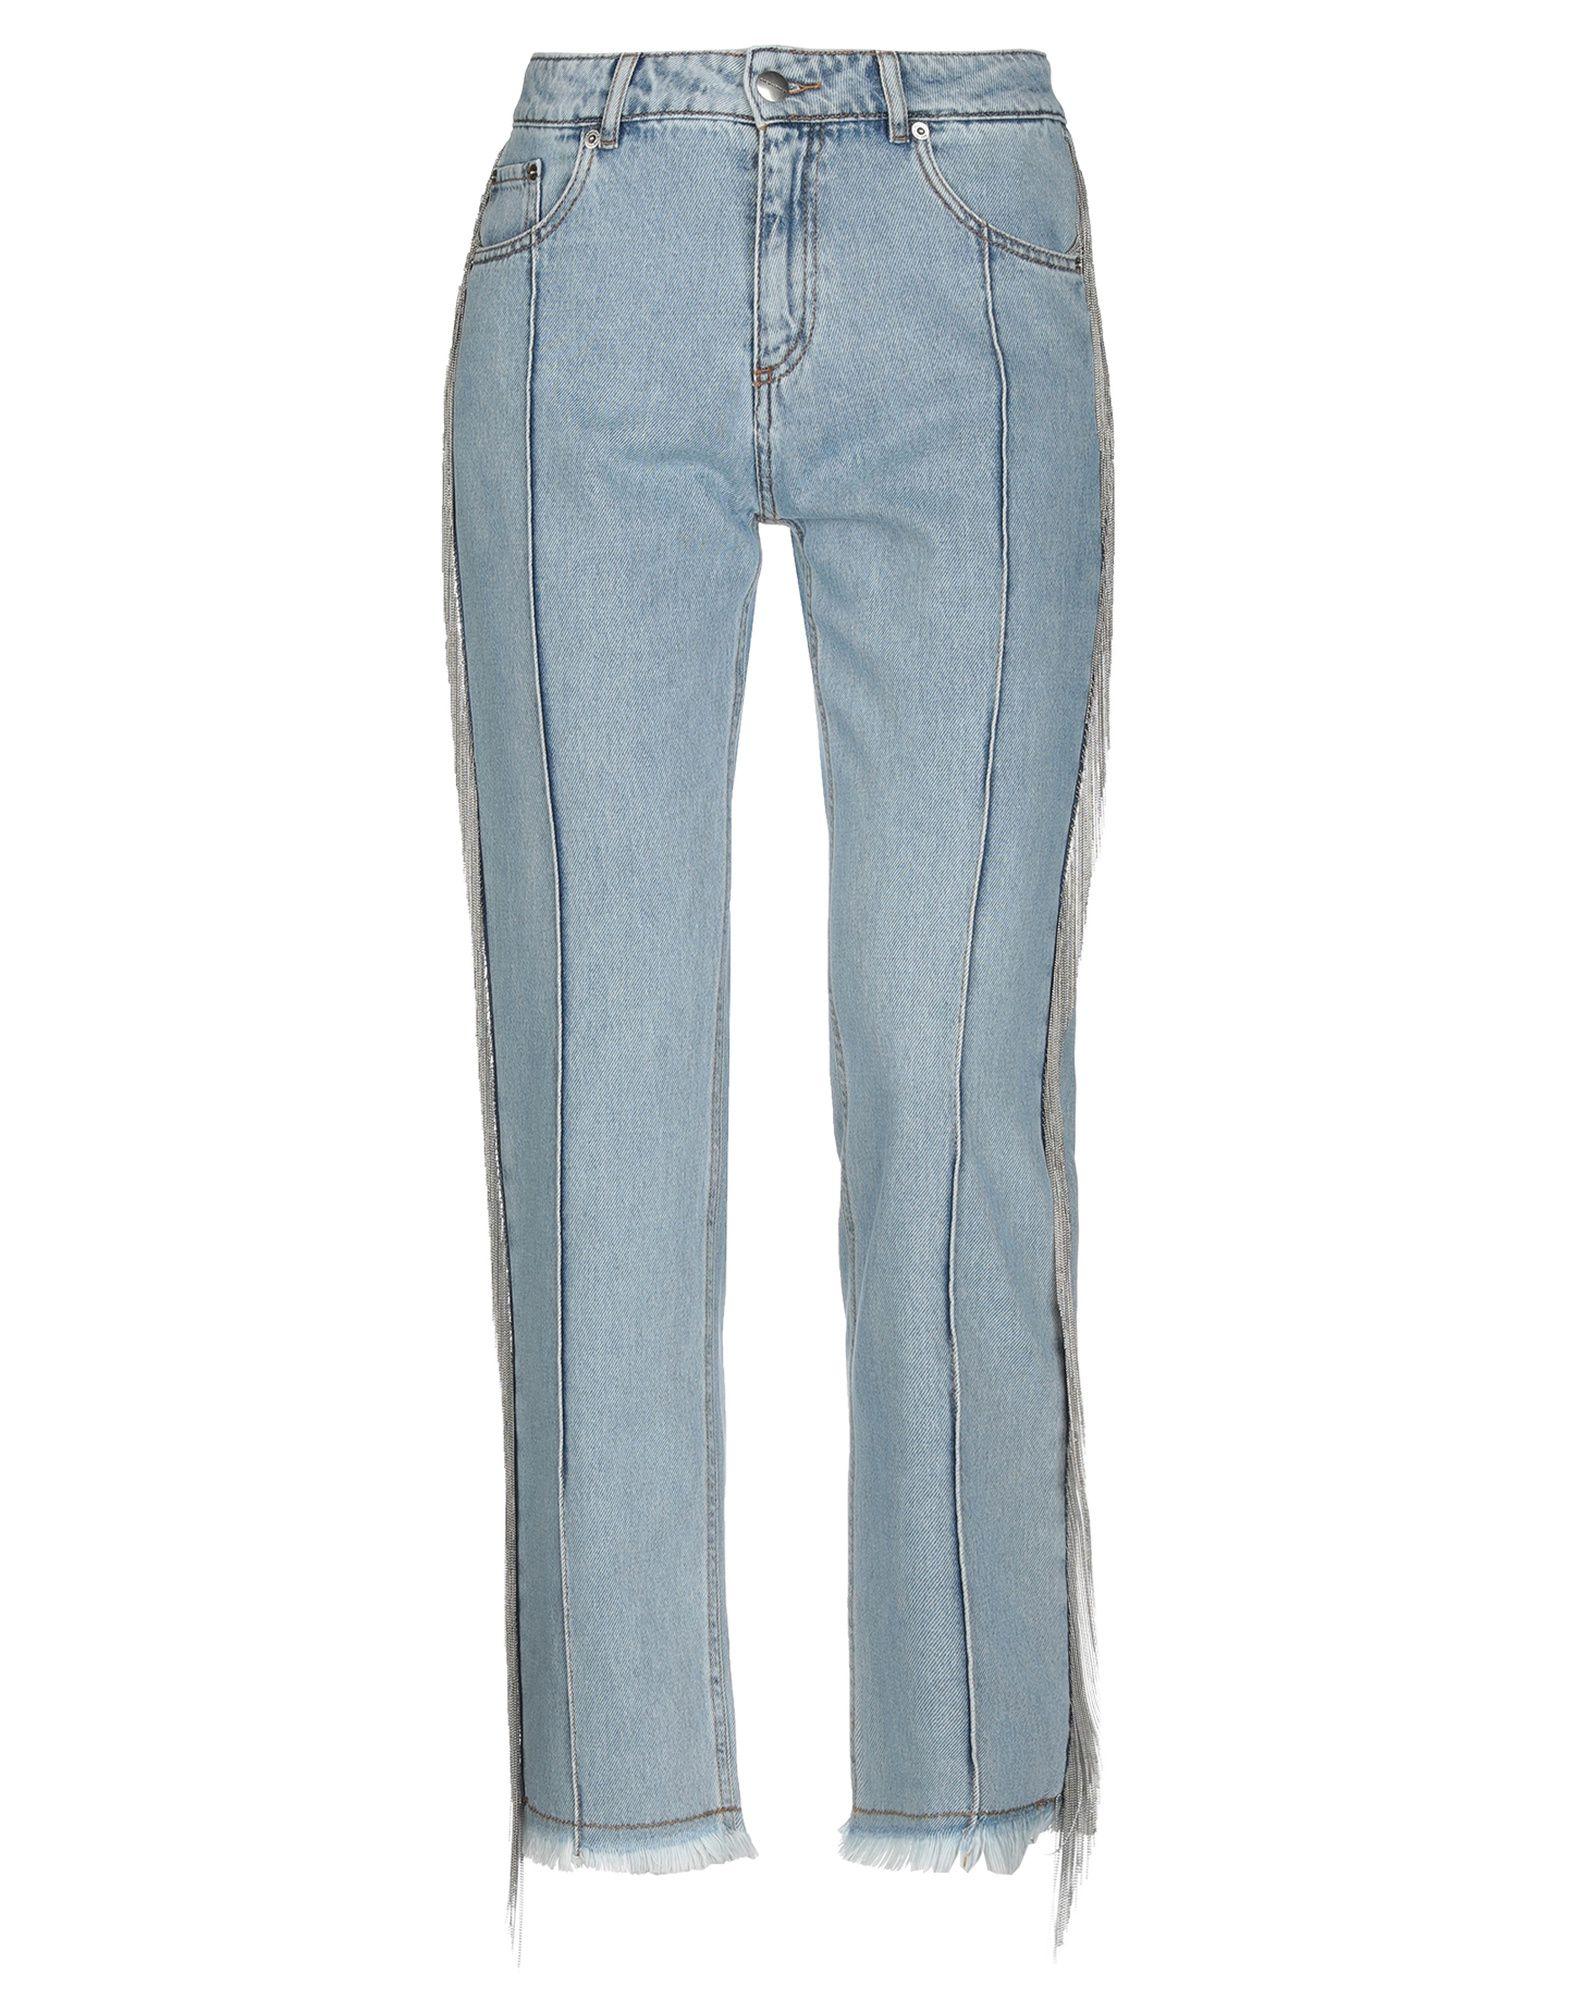 EACH X OTHER Джинсовые брюки each x other повседневные брюки